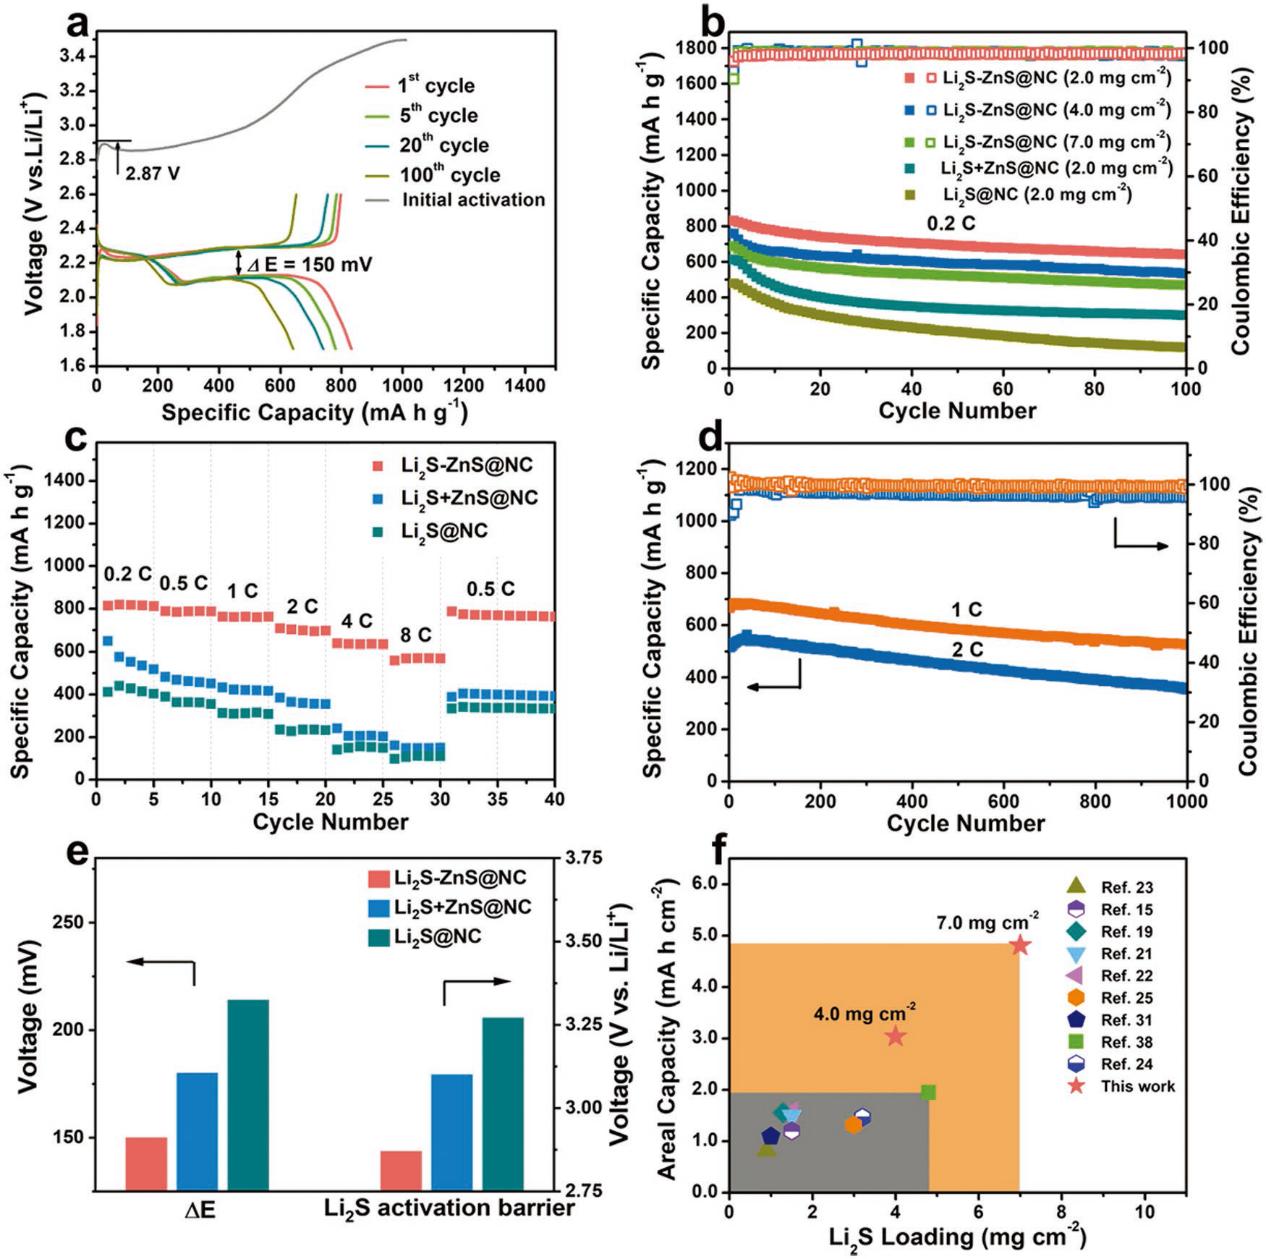 Adv. Funct. Mater.: 分子笼纳米限域封装廉价无机锂盐构筑高活性、低成本纳米硫化锂正极